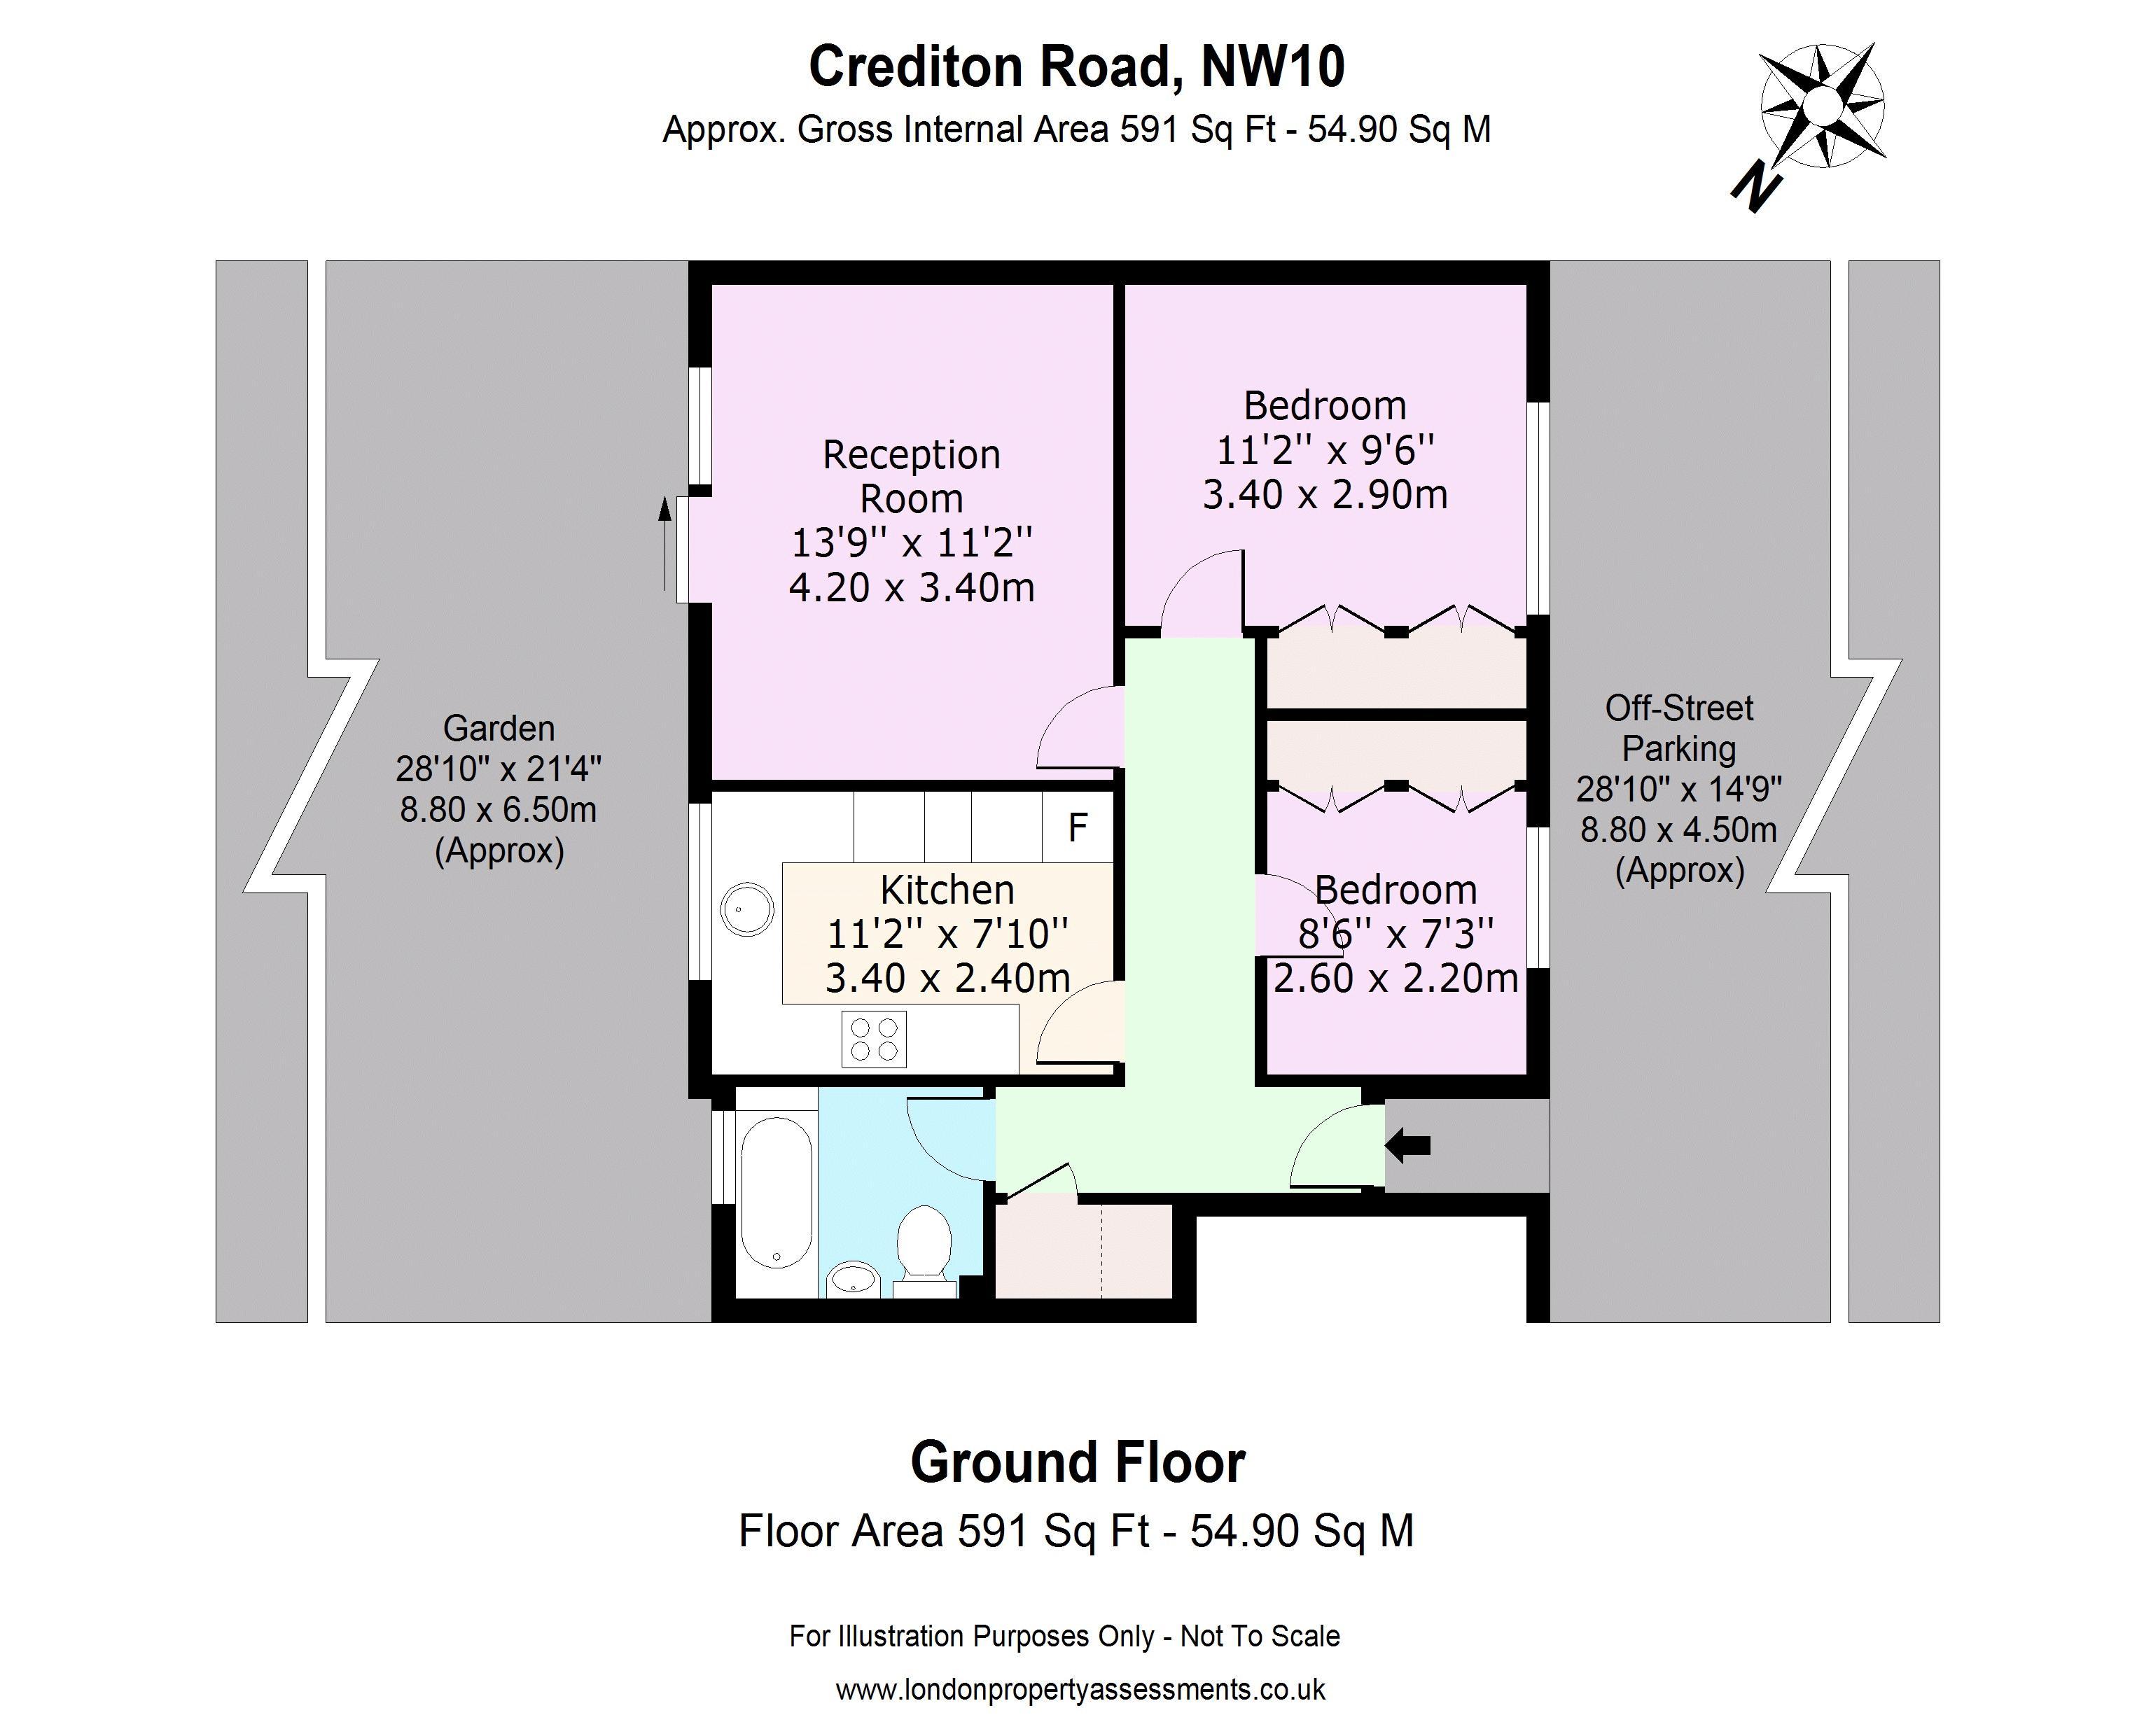 53 Crediton Road